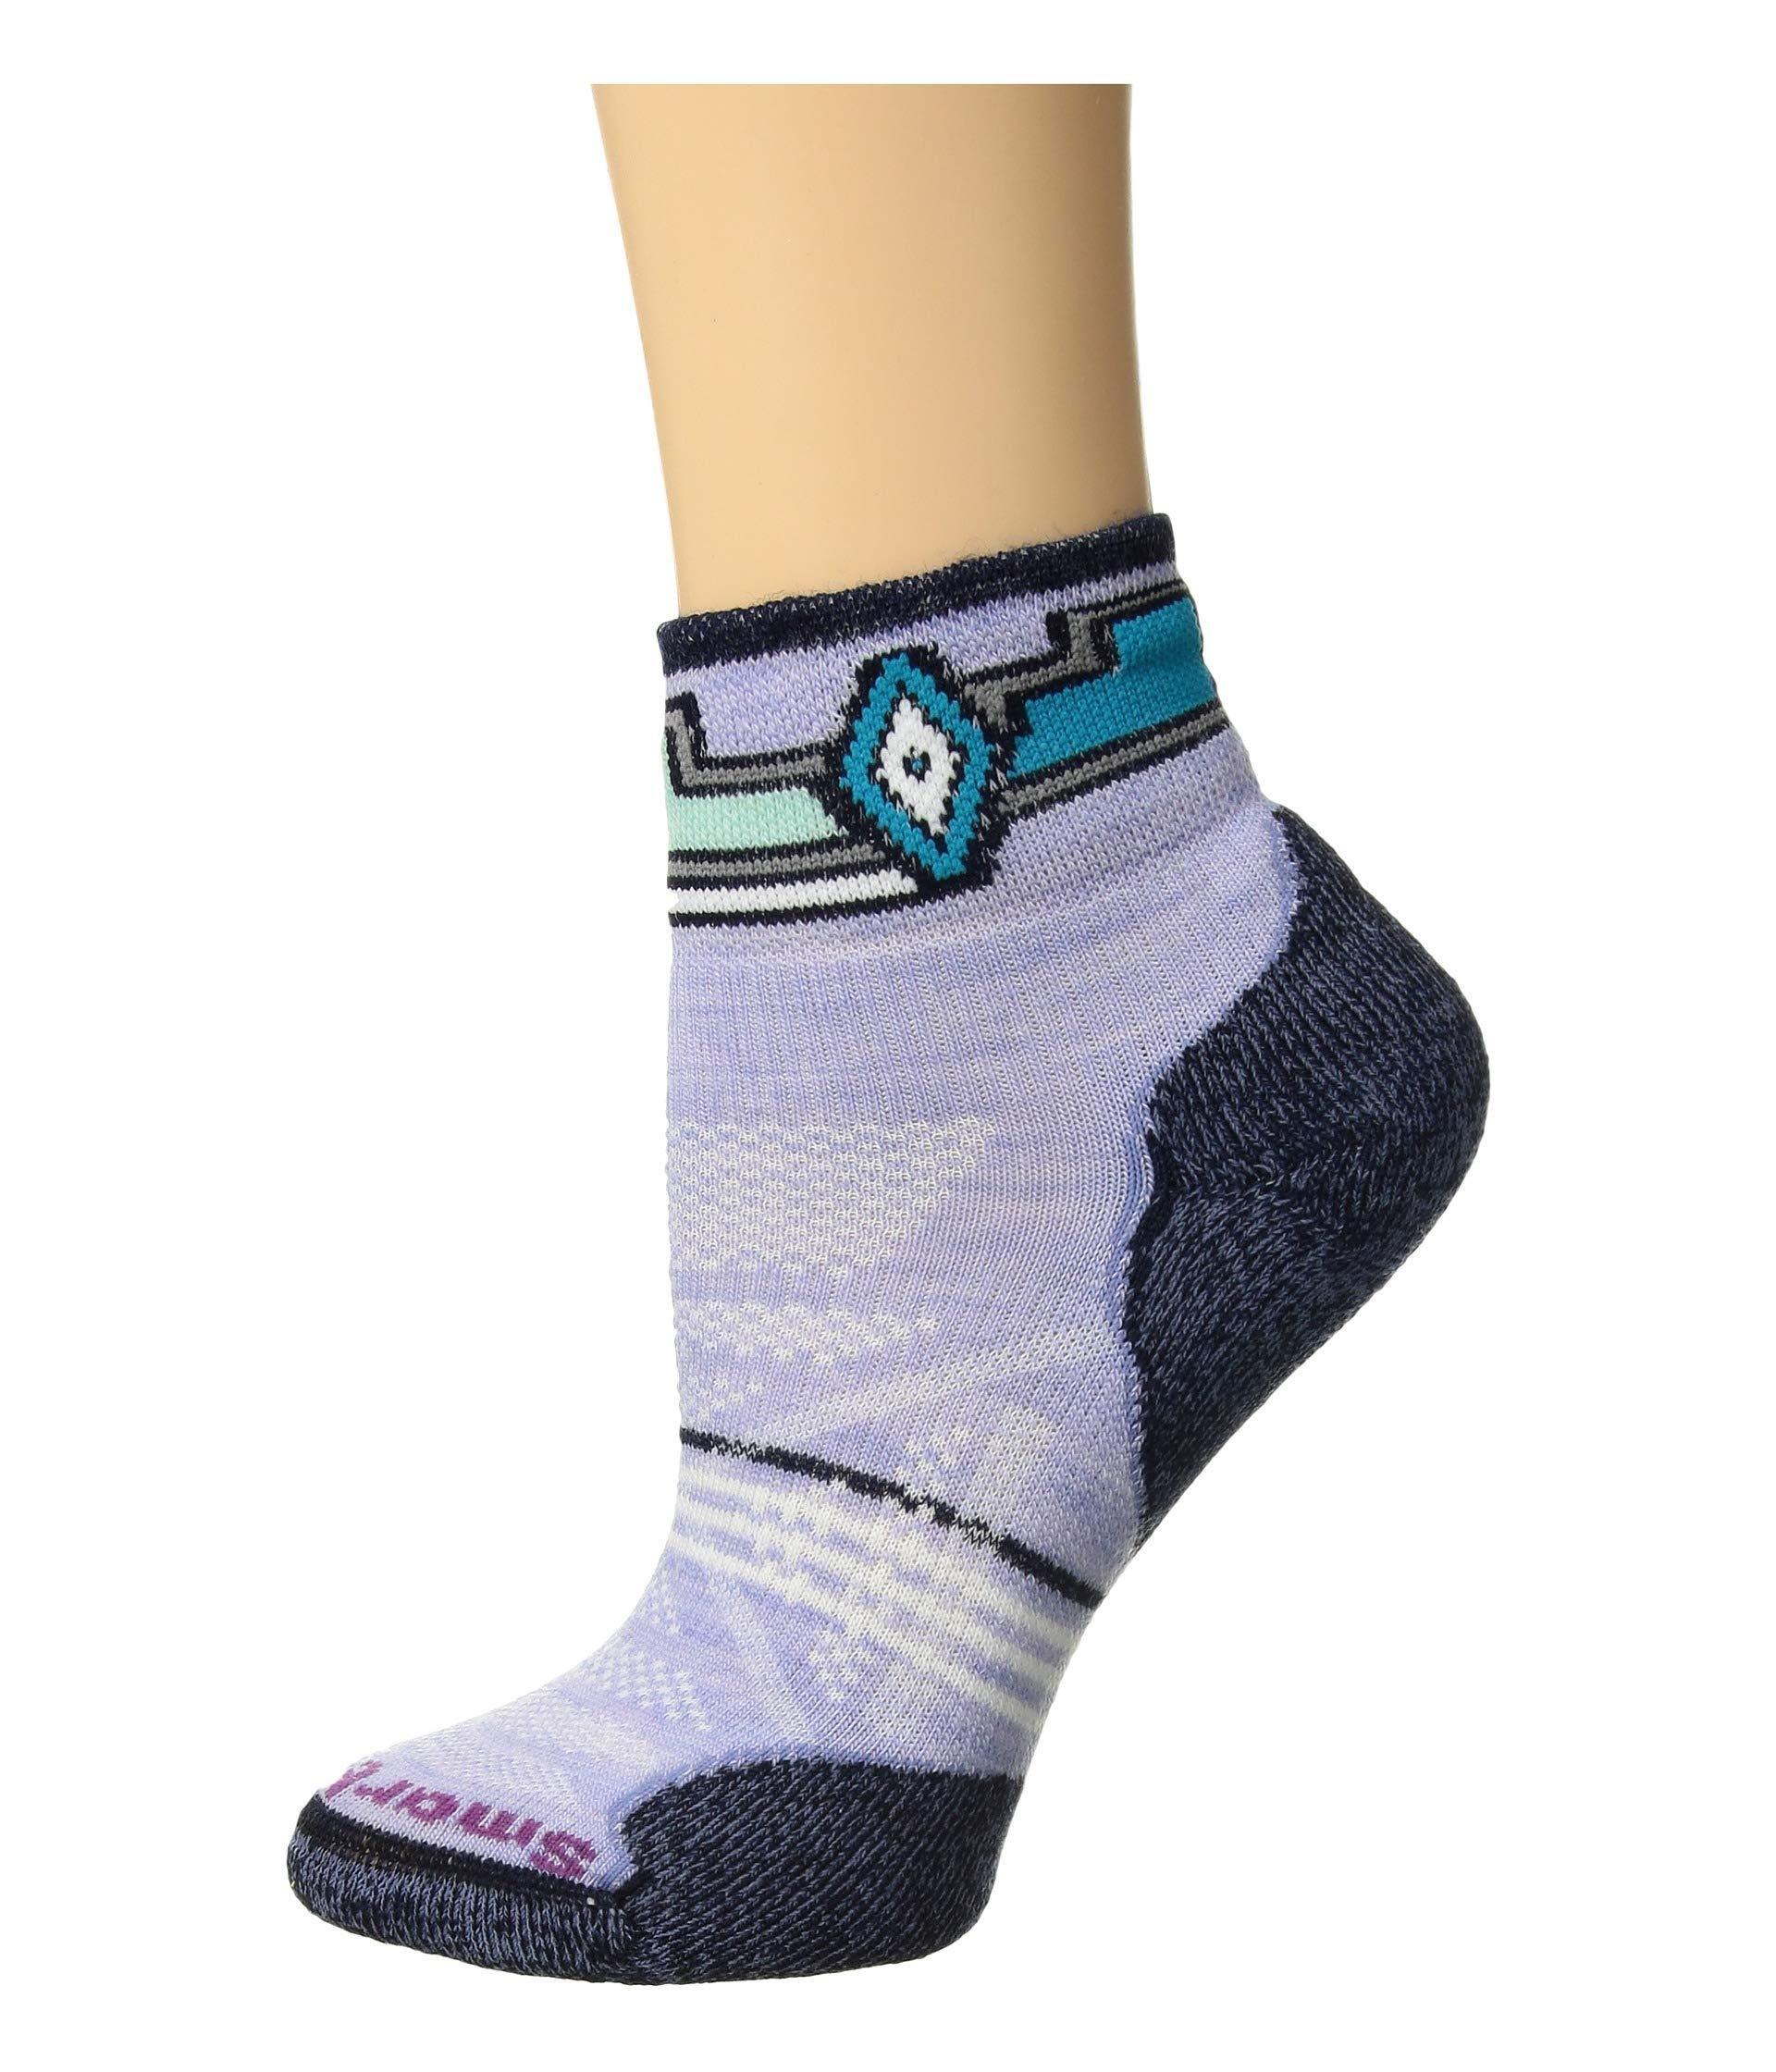 f5c4795d6 Smartwool. Phd Outdoor Light Pattern Mini (purple Mist) Women s Crew Cut  Socks Shoes